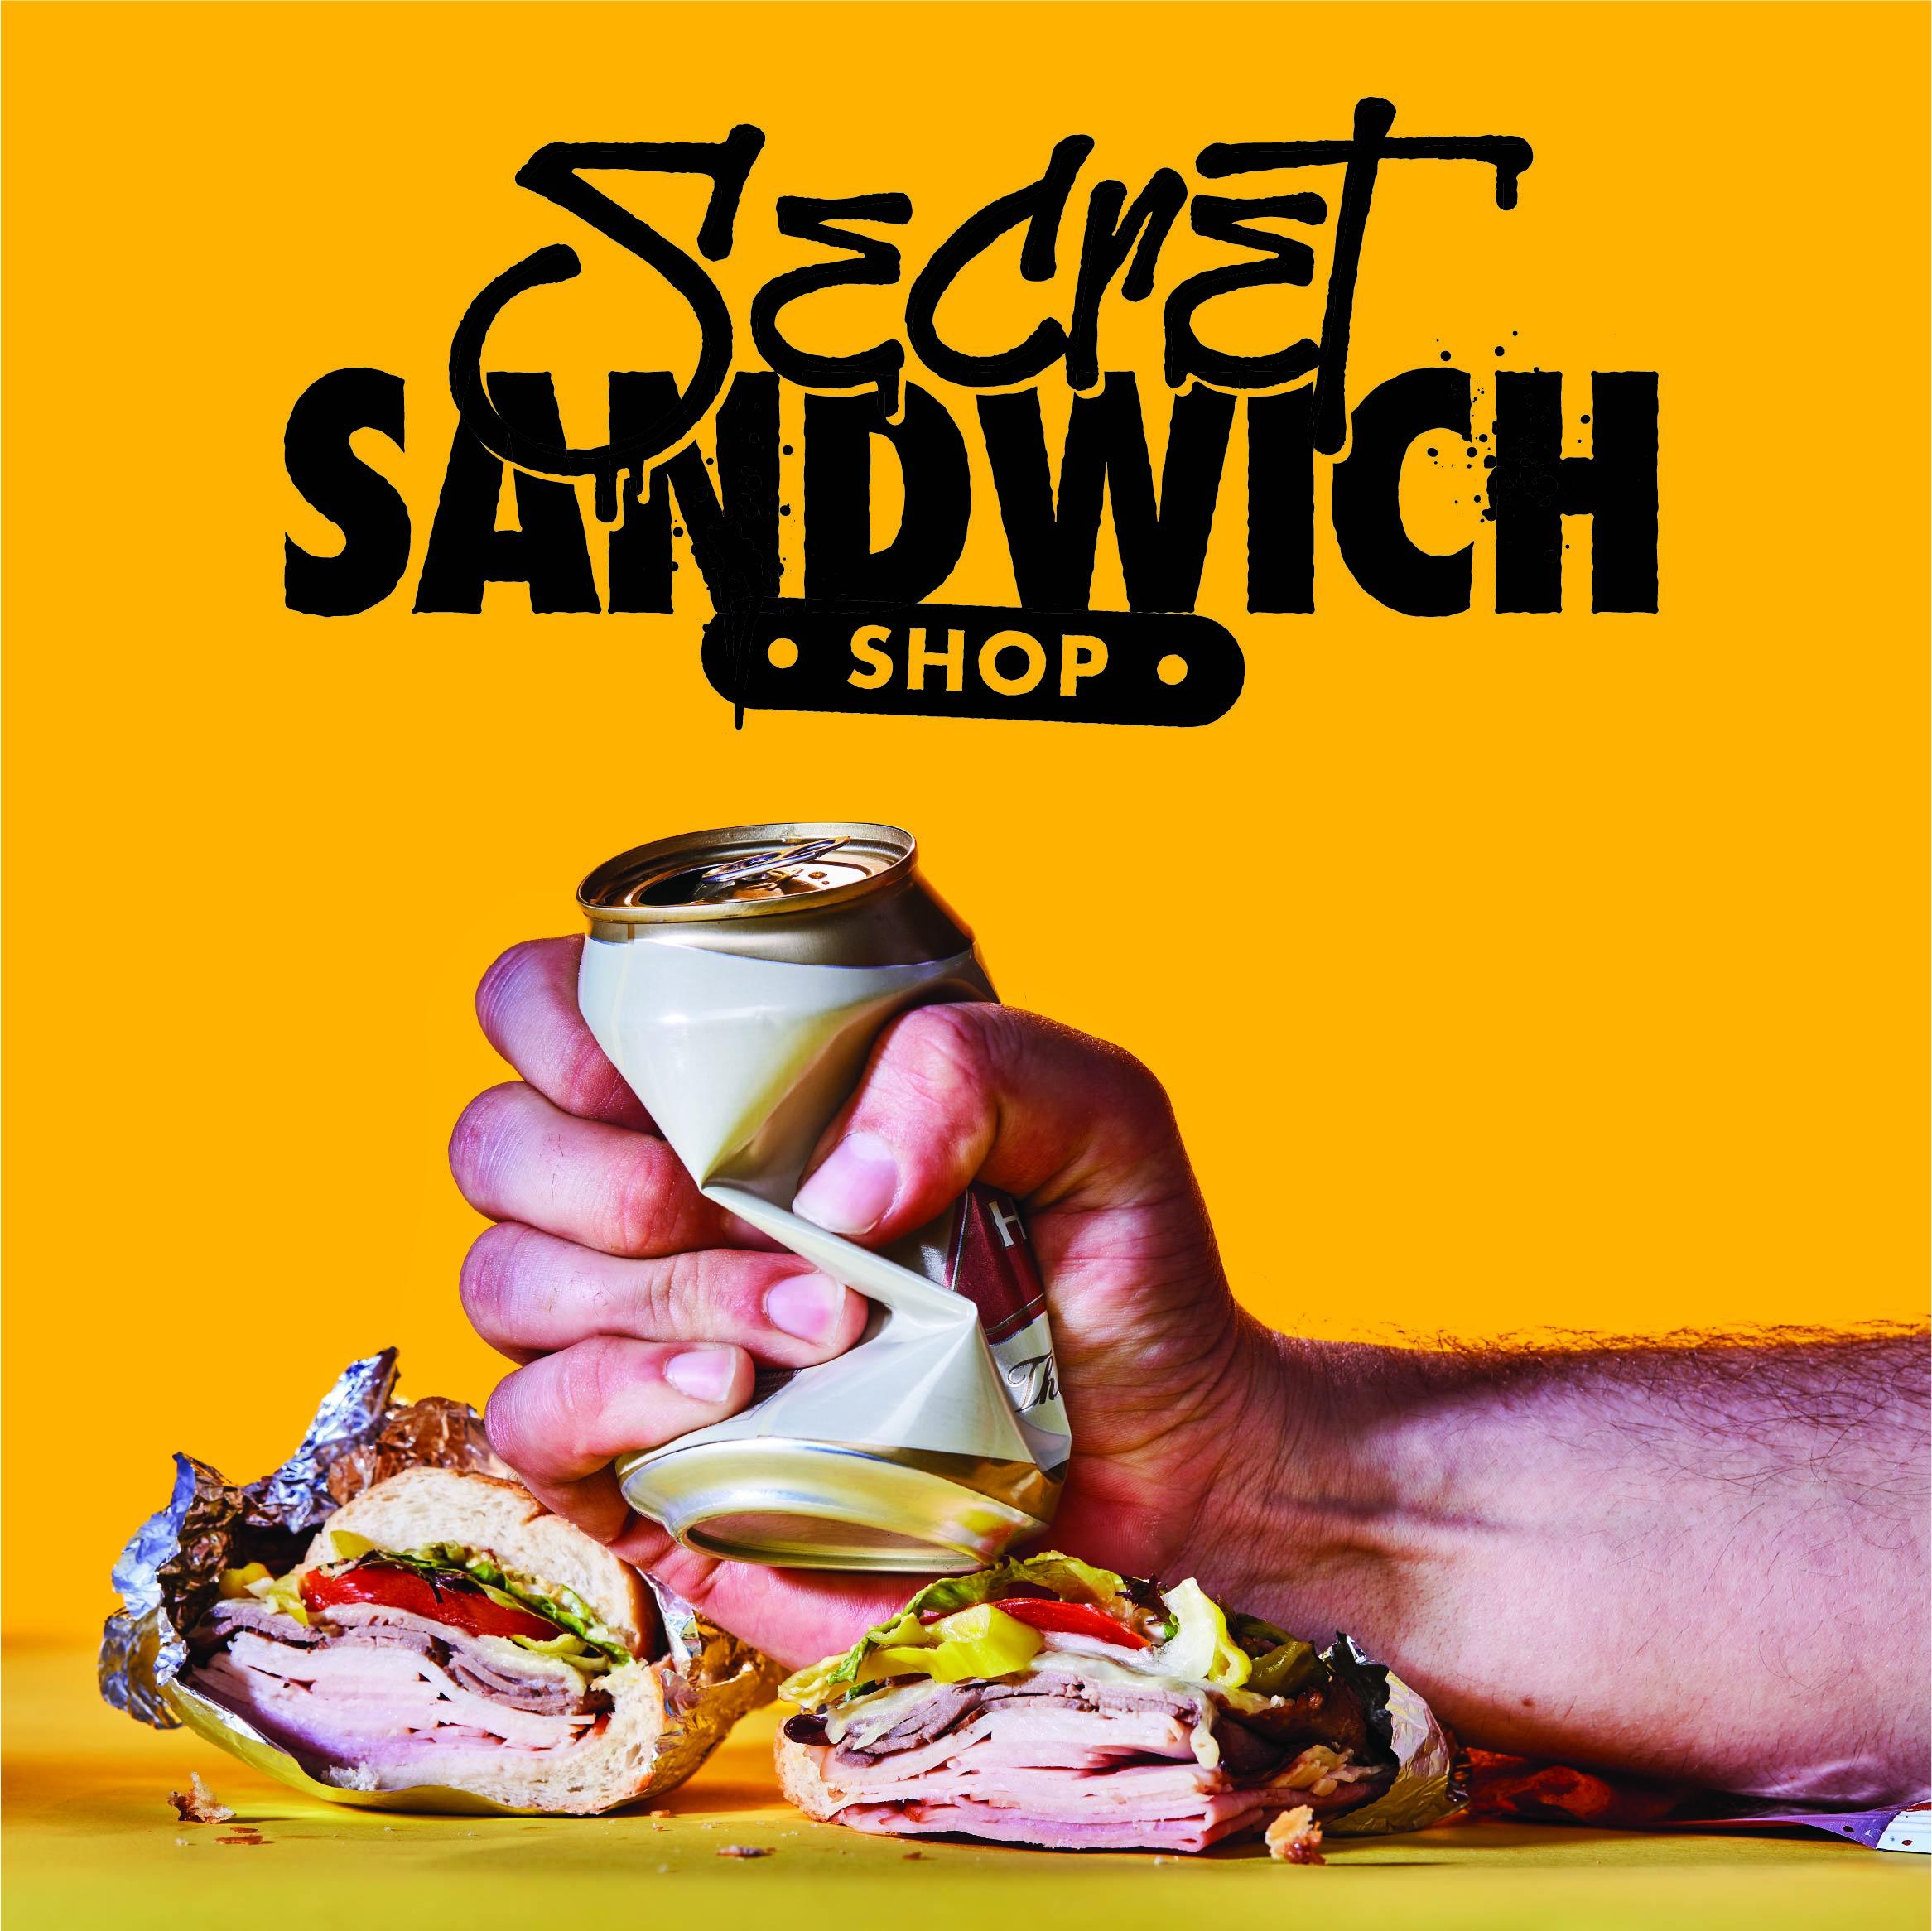 Secret Sandwich Shop Brand Design | Fried Design Co.